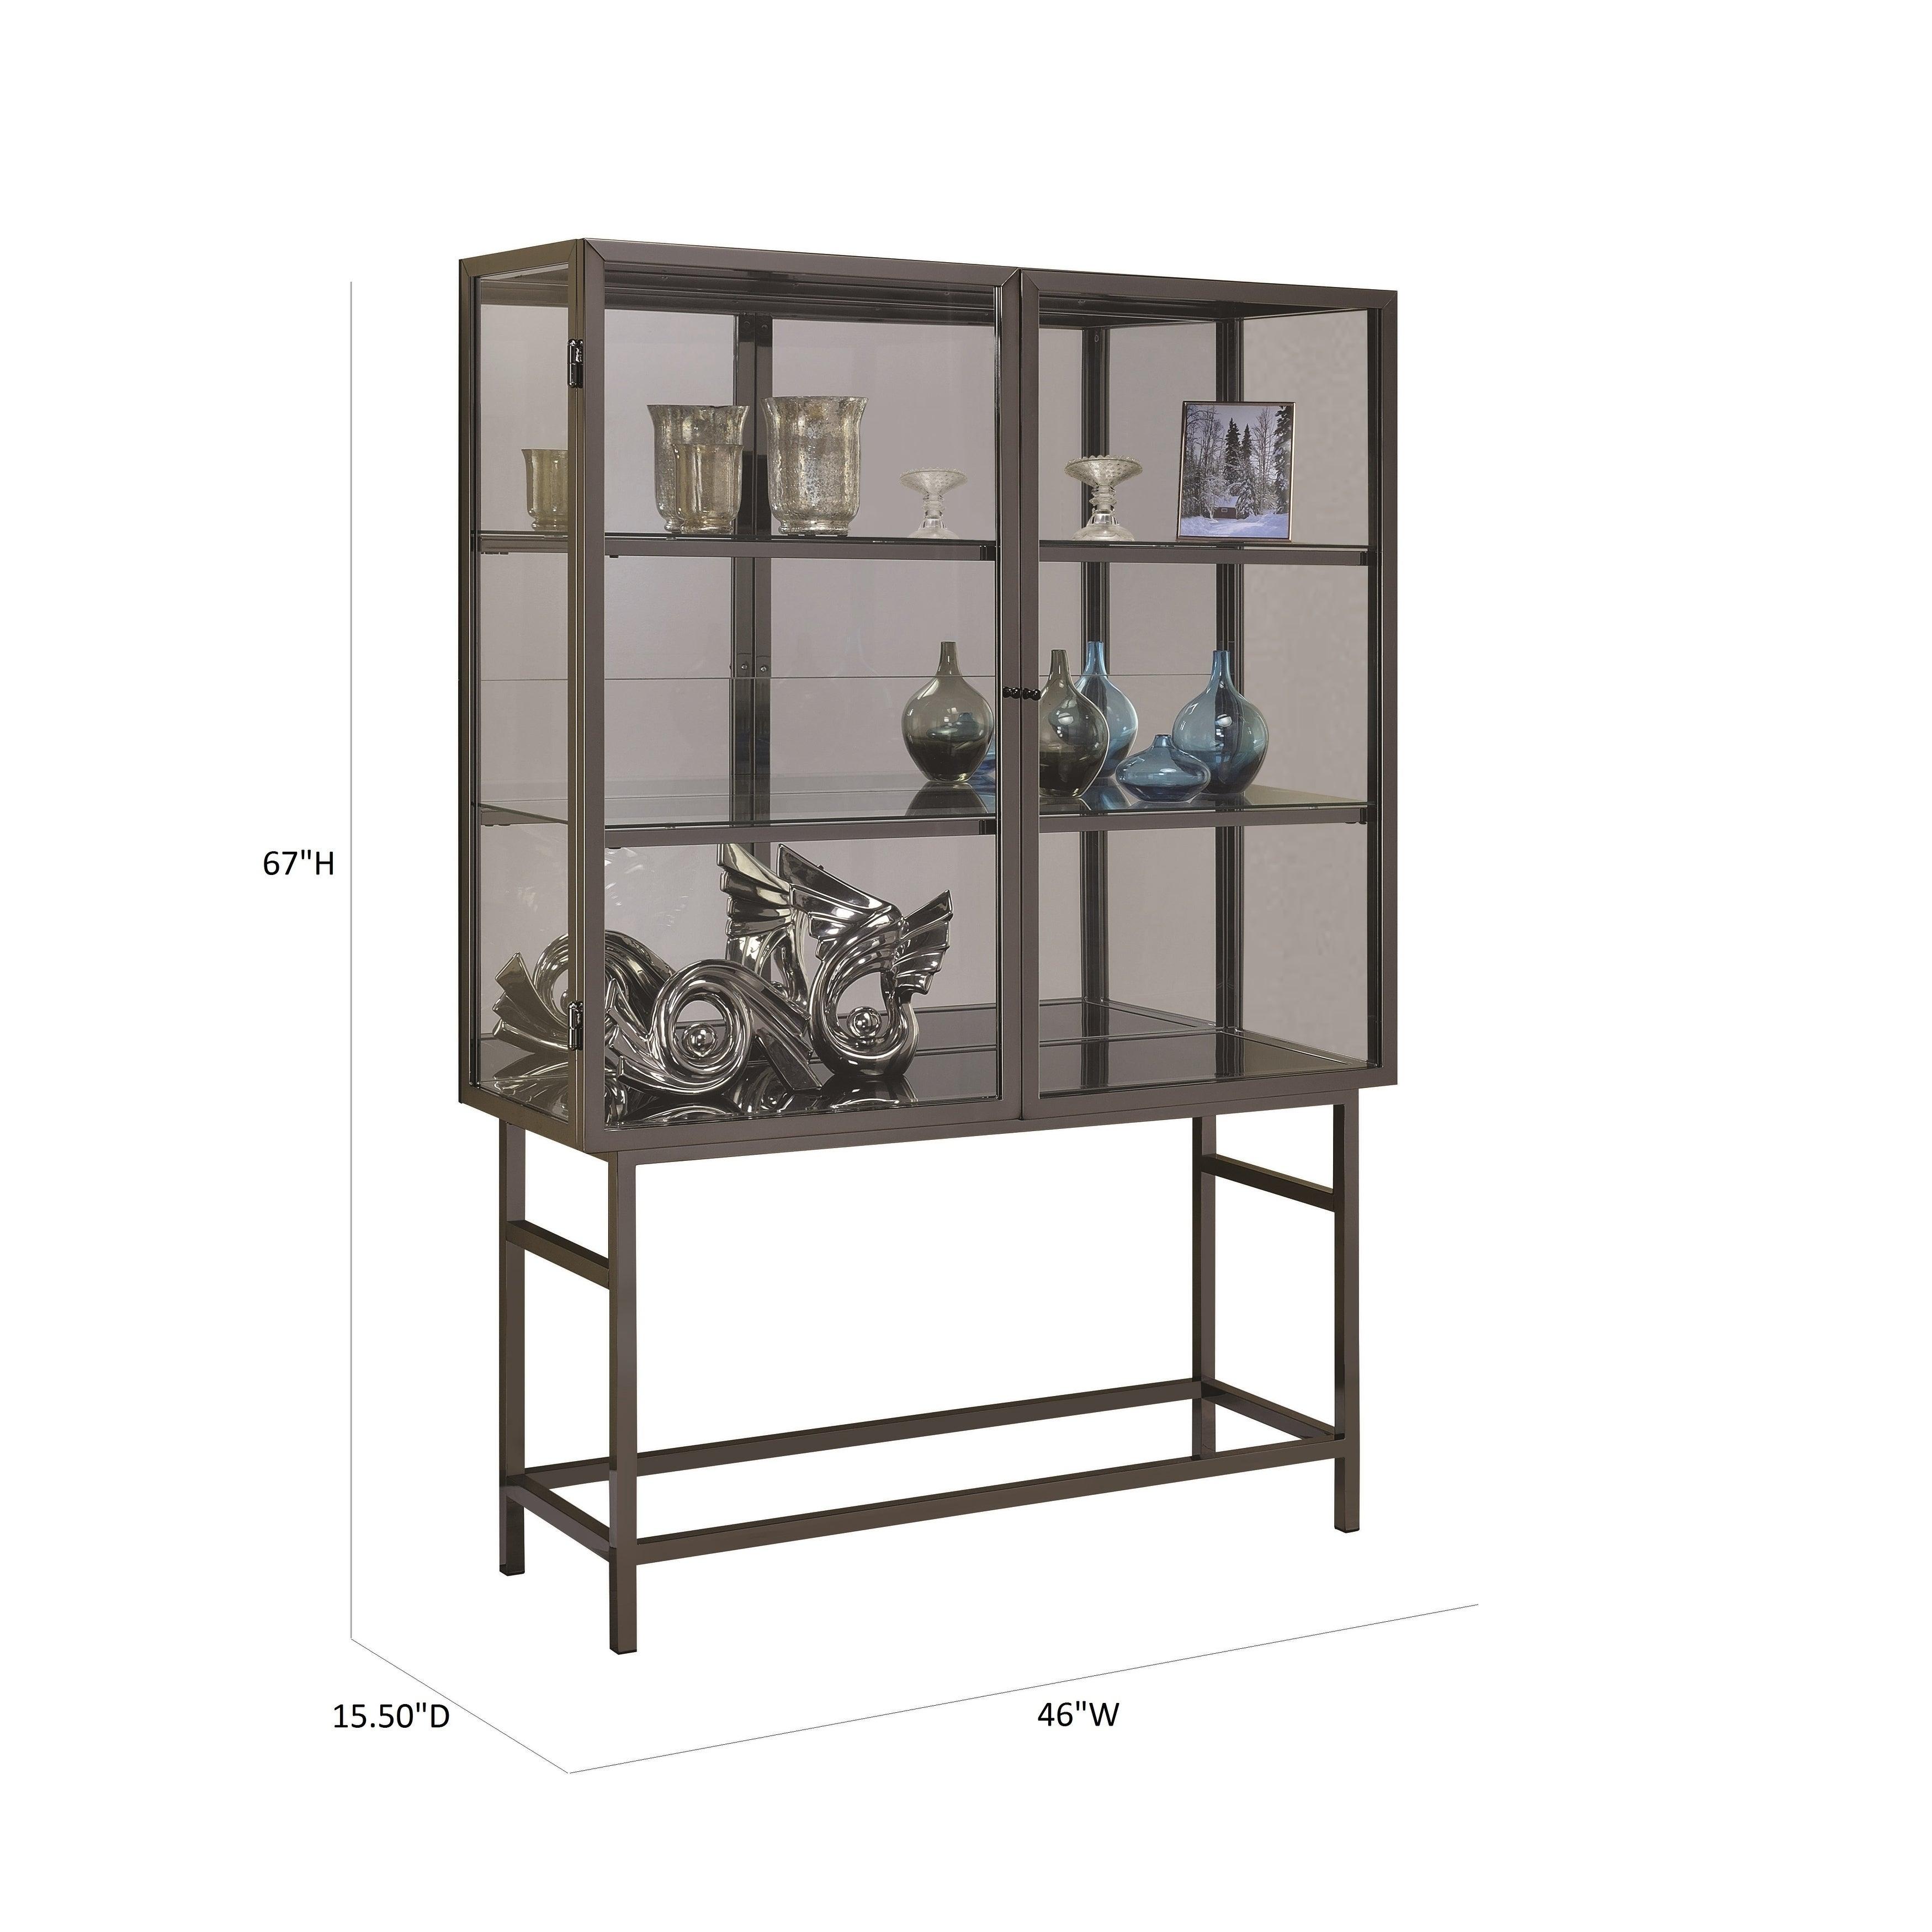 Brush Black Nickel 2 Door Curio Cabinet